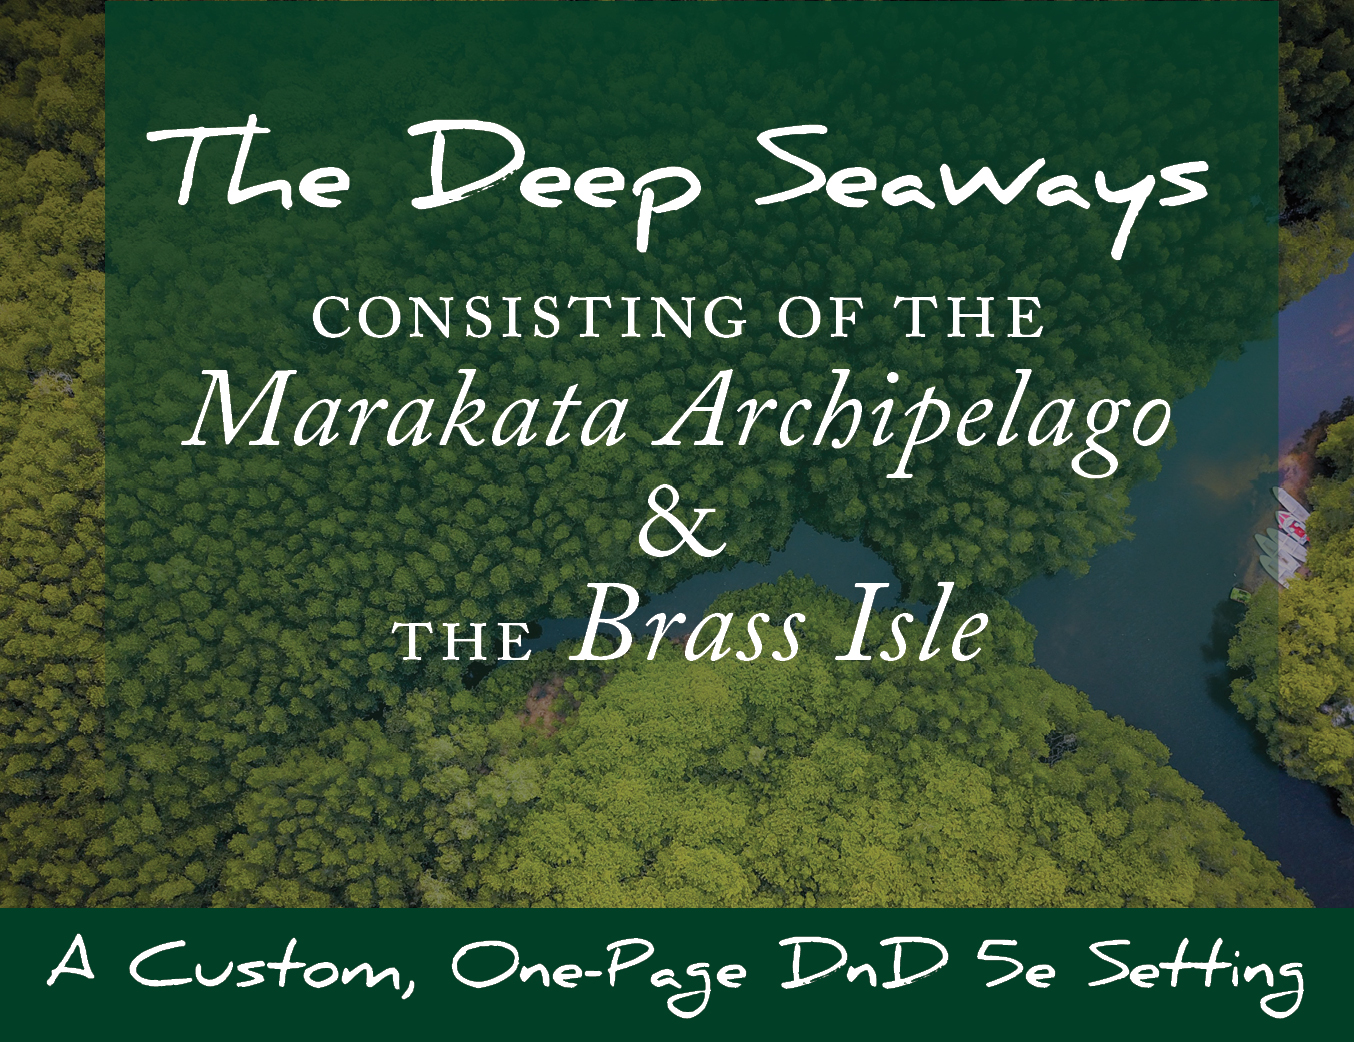 The Deep Seaways of Marakata